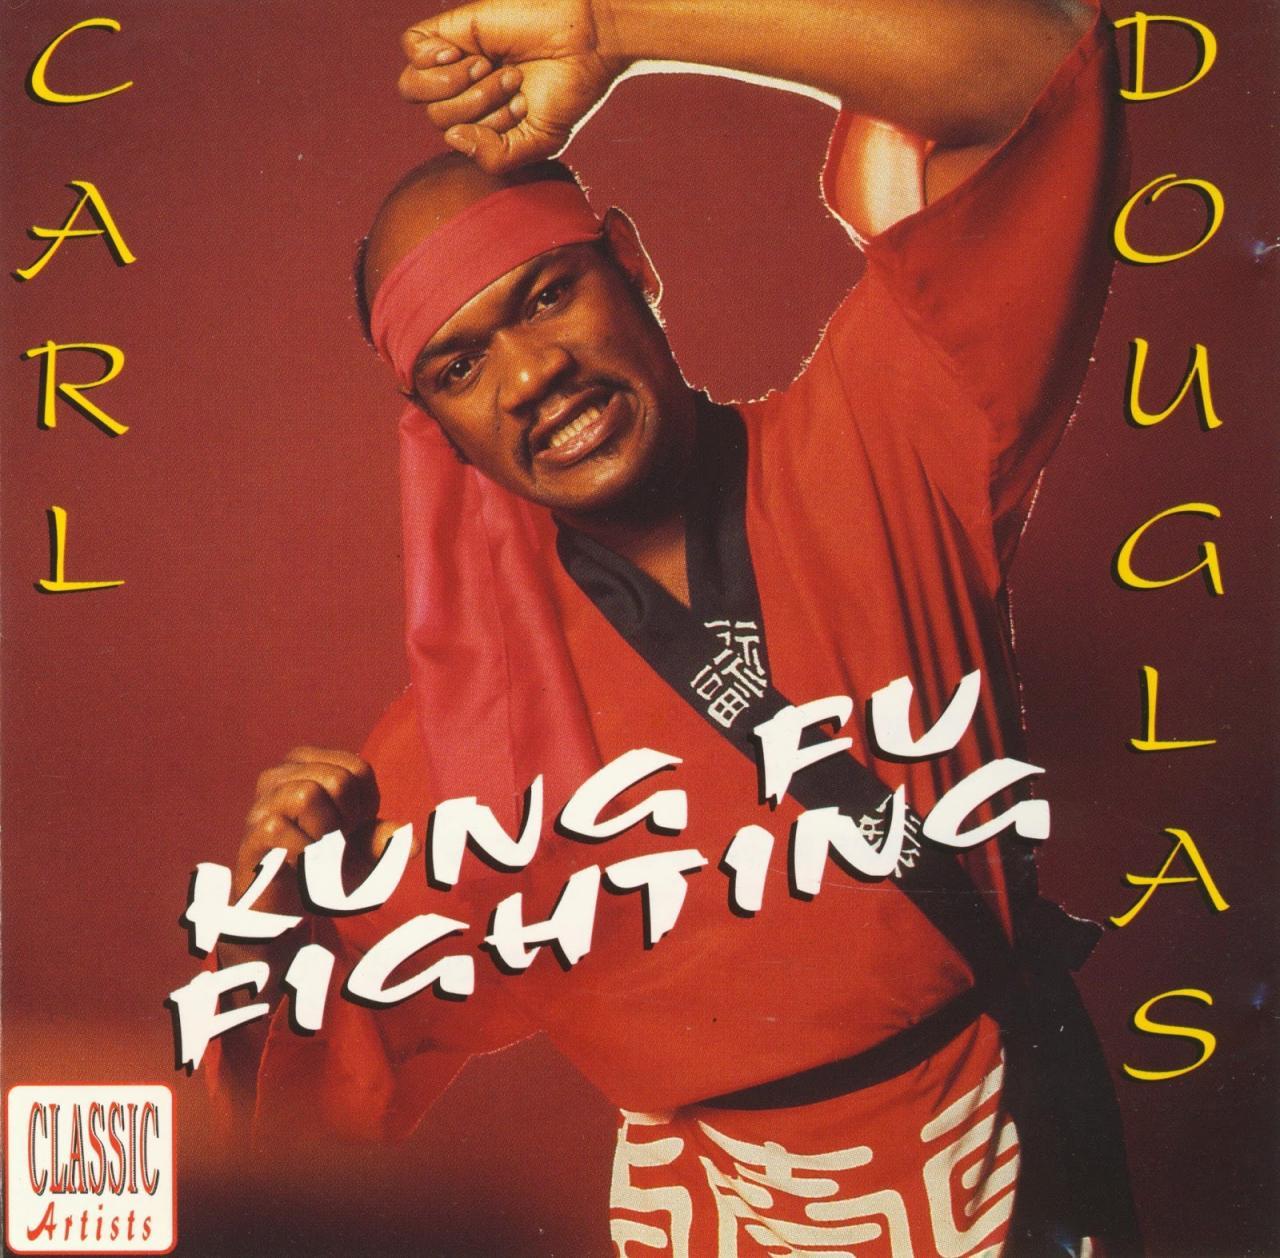 Carl Douglas - Kung Fu Fighting mp3 download